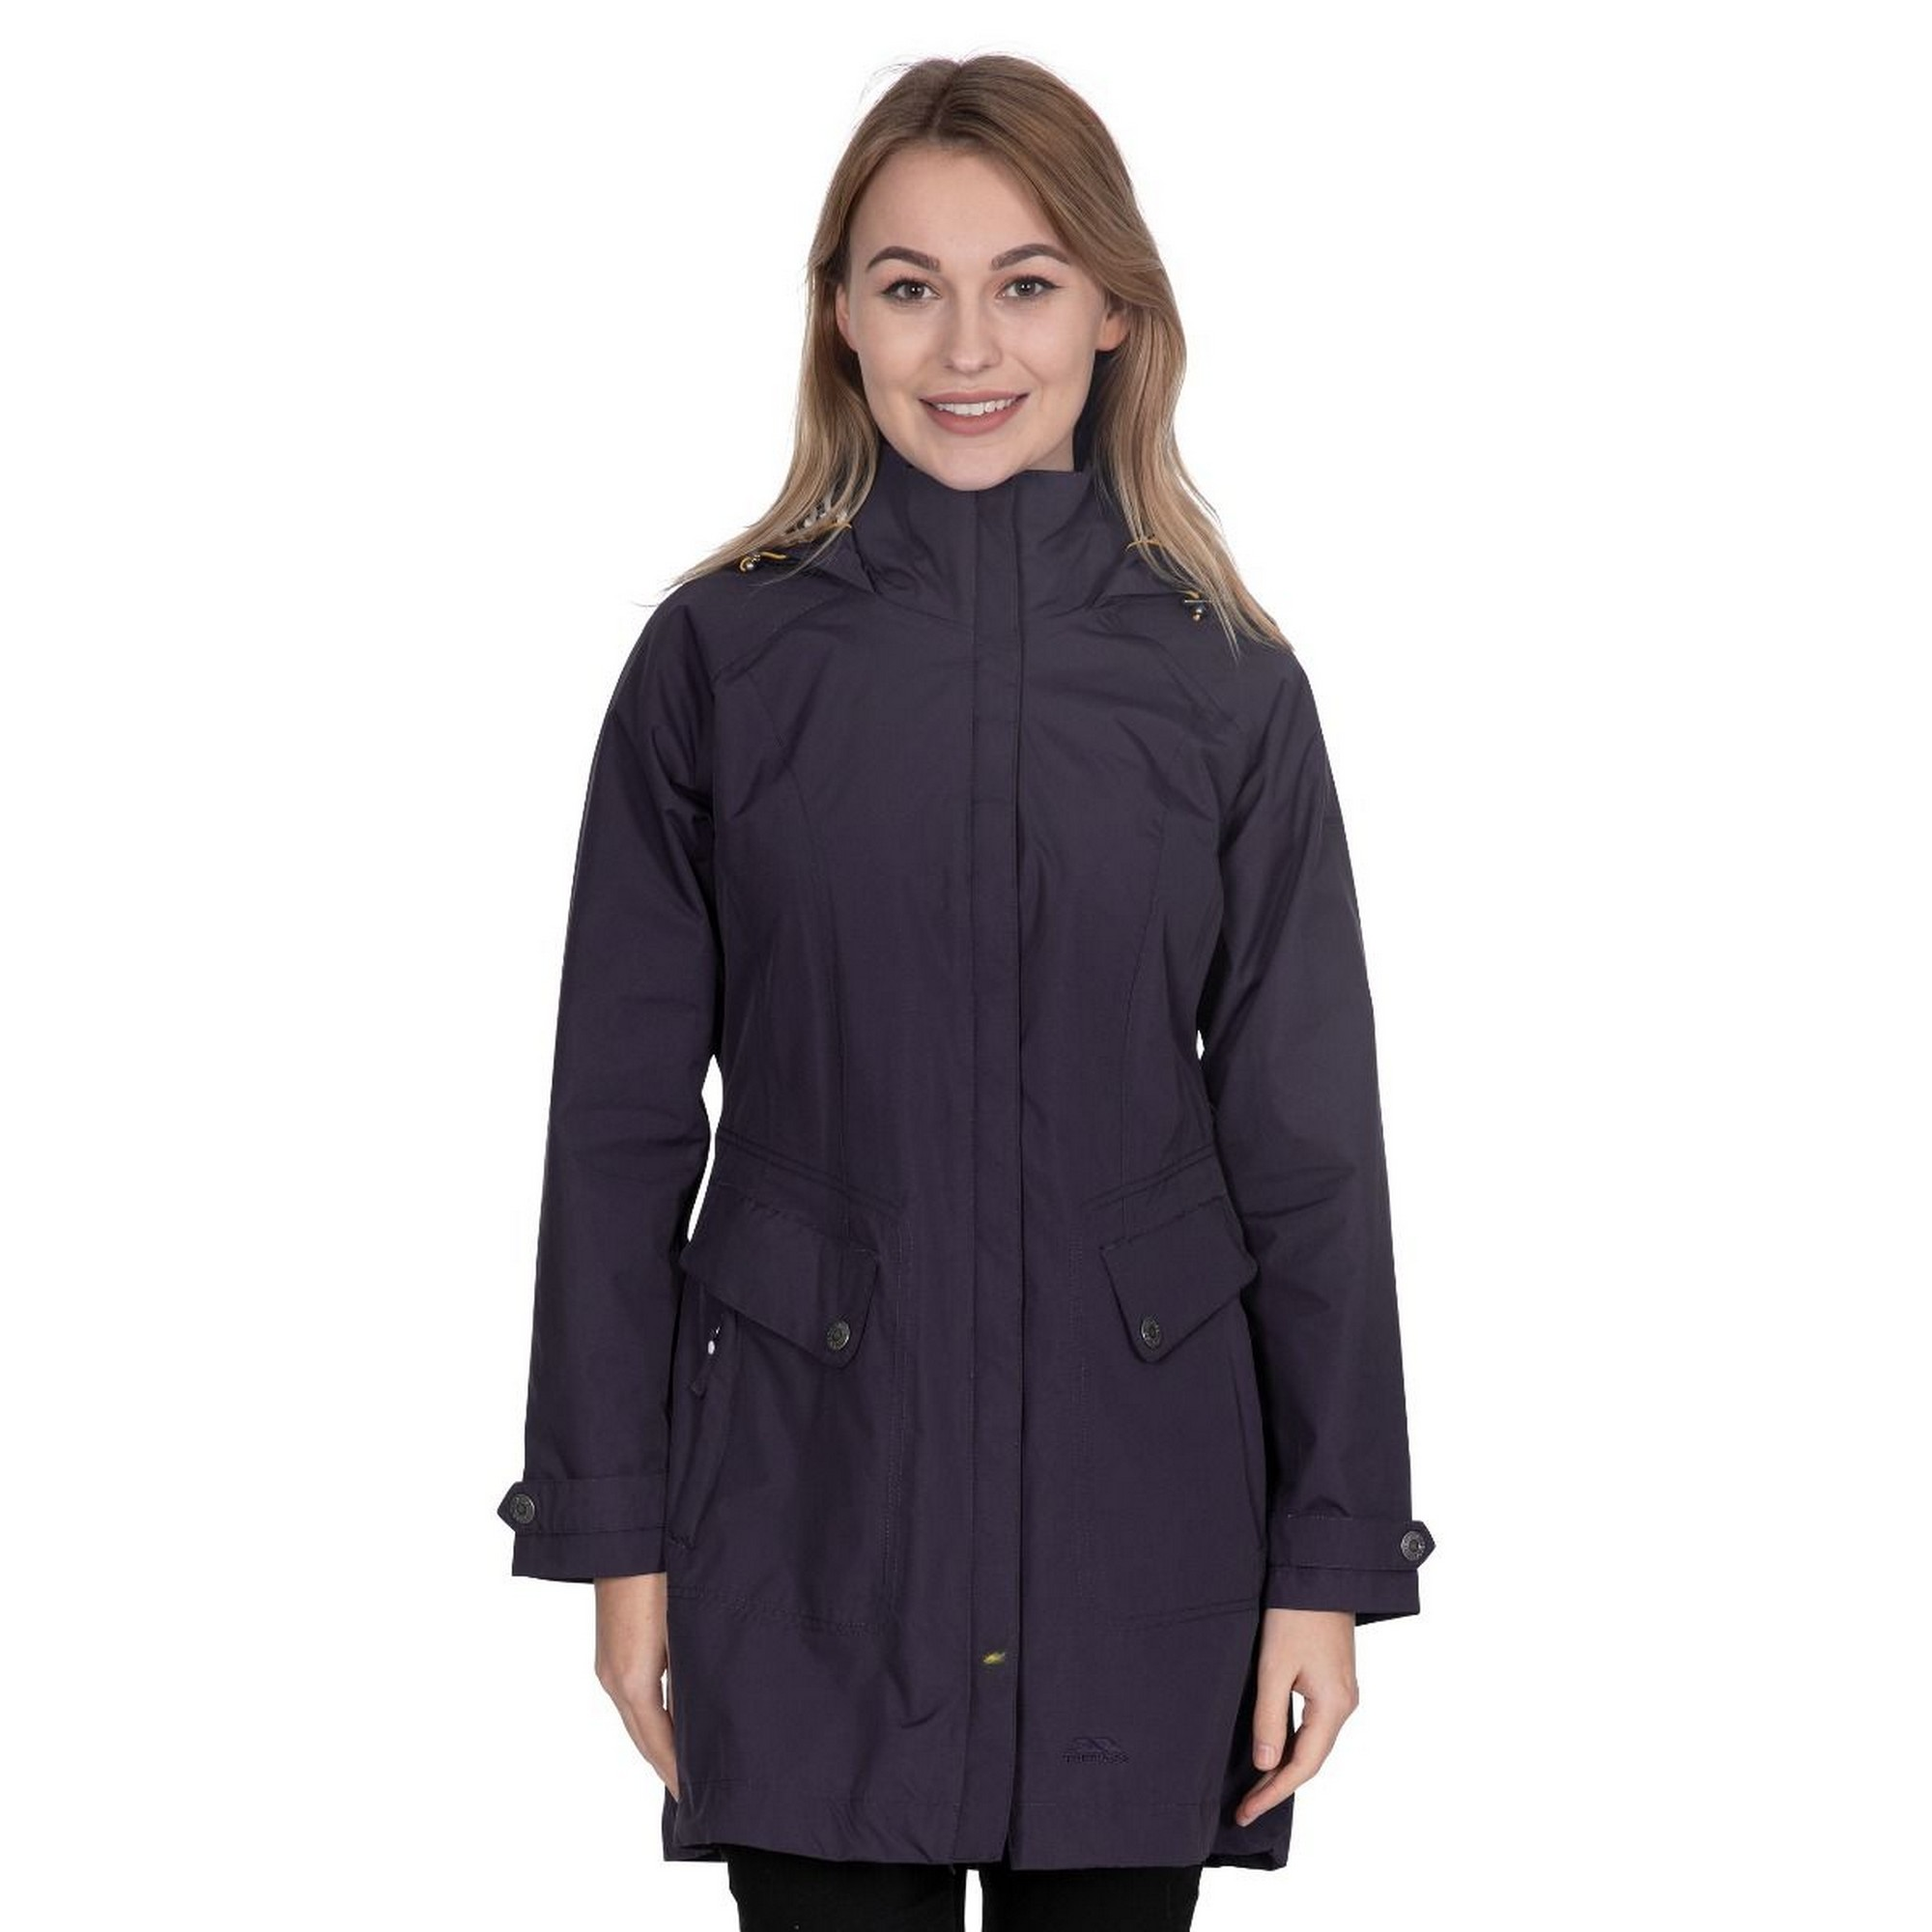 Trespass-Womens-Ladies-Rainy-Day-Waterproof-Jacket-TP3613 thumbnail 16